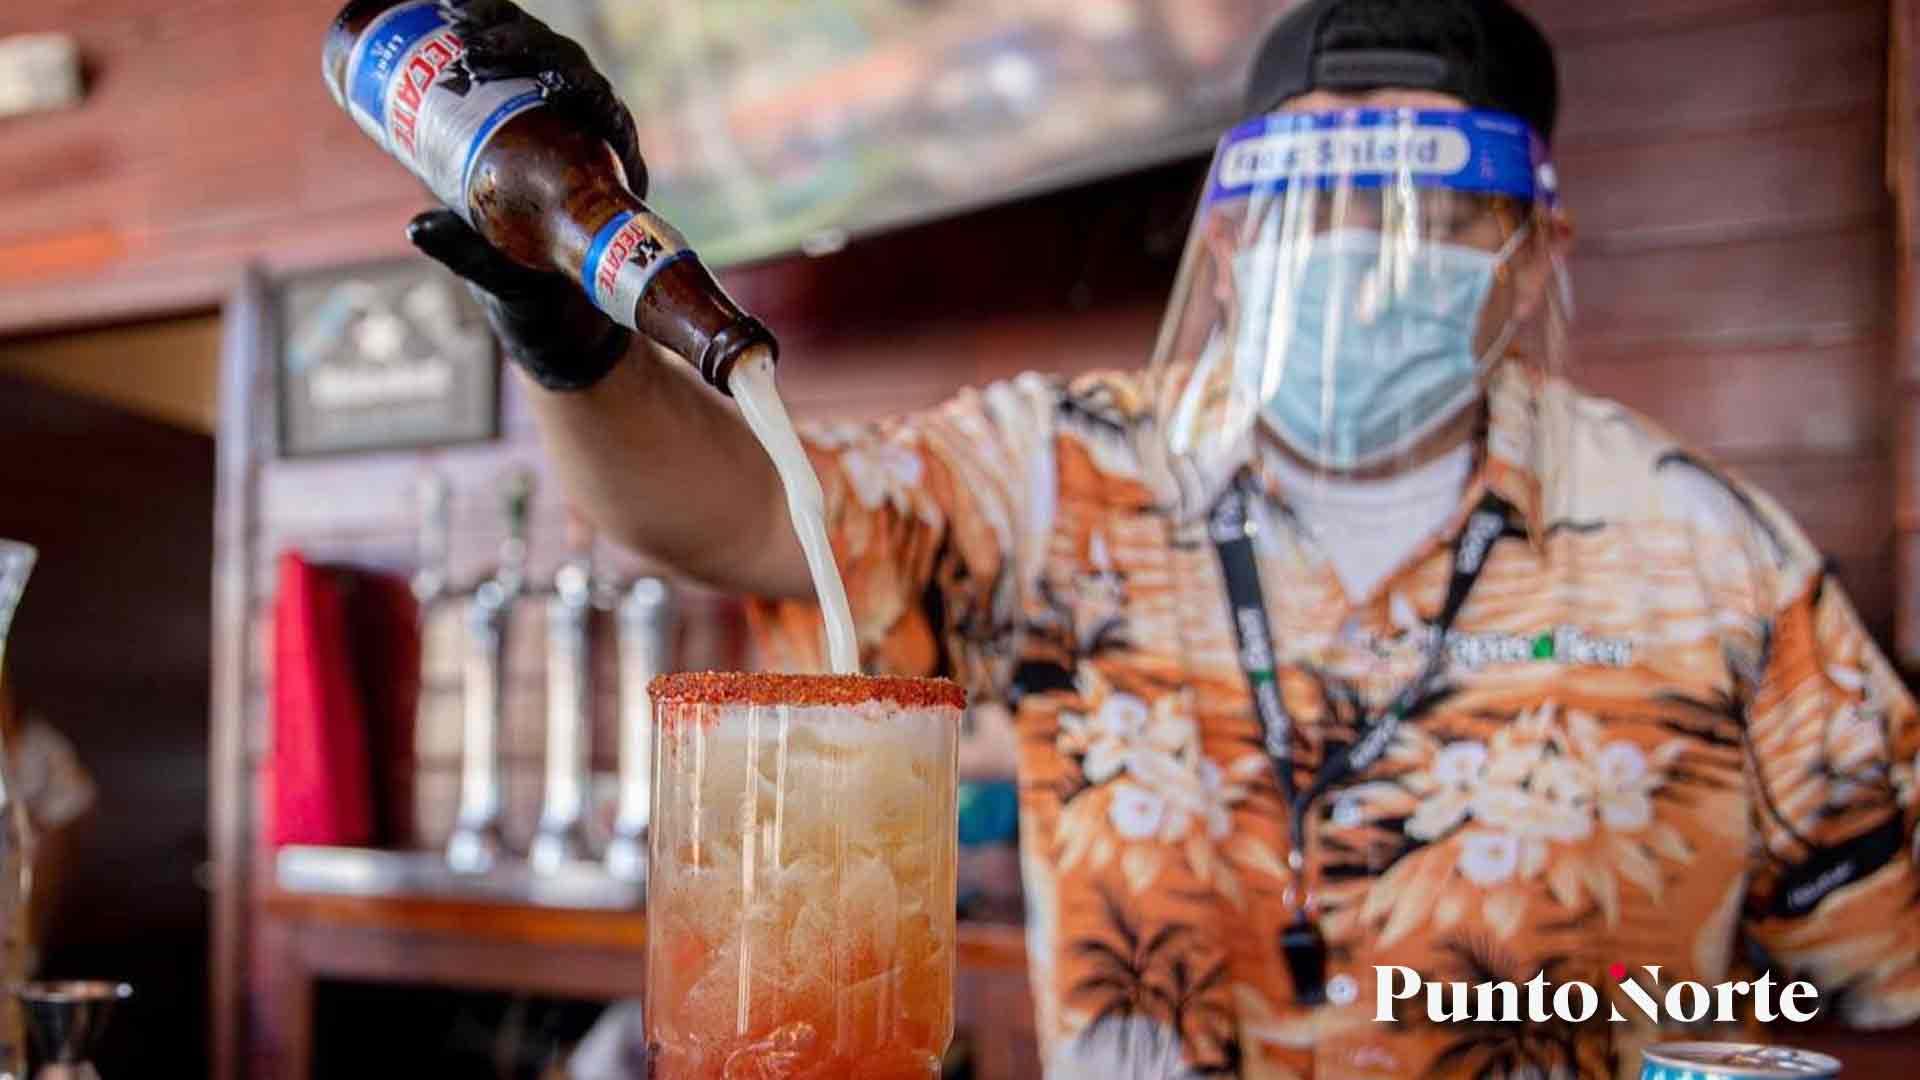 Contrario a lo que dijo Bonilla, abren Papas & Beer en Rosarito con aprobación de alcaldesa